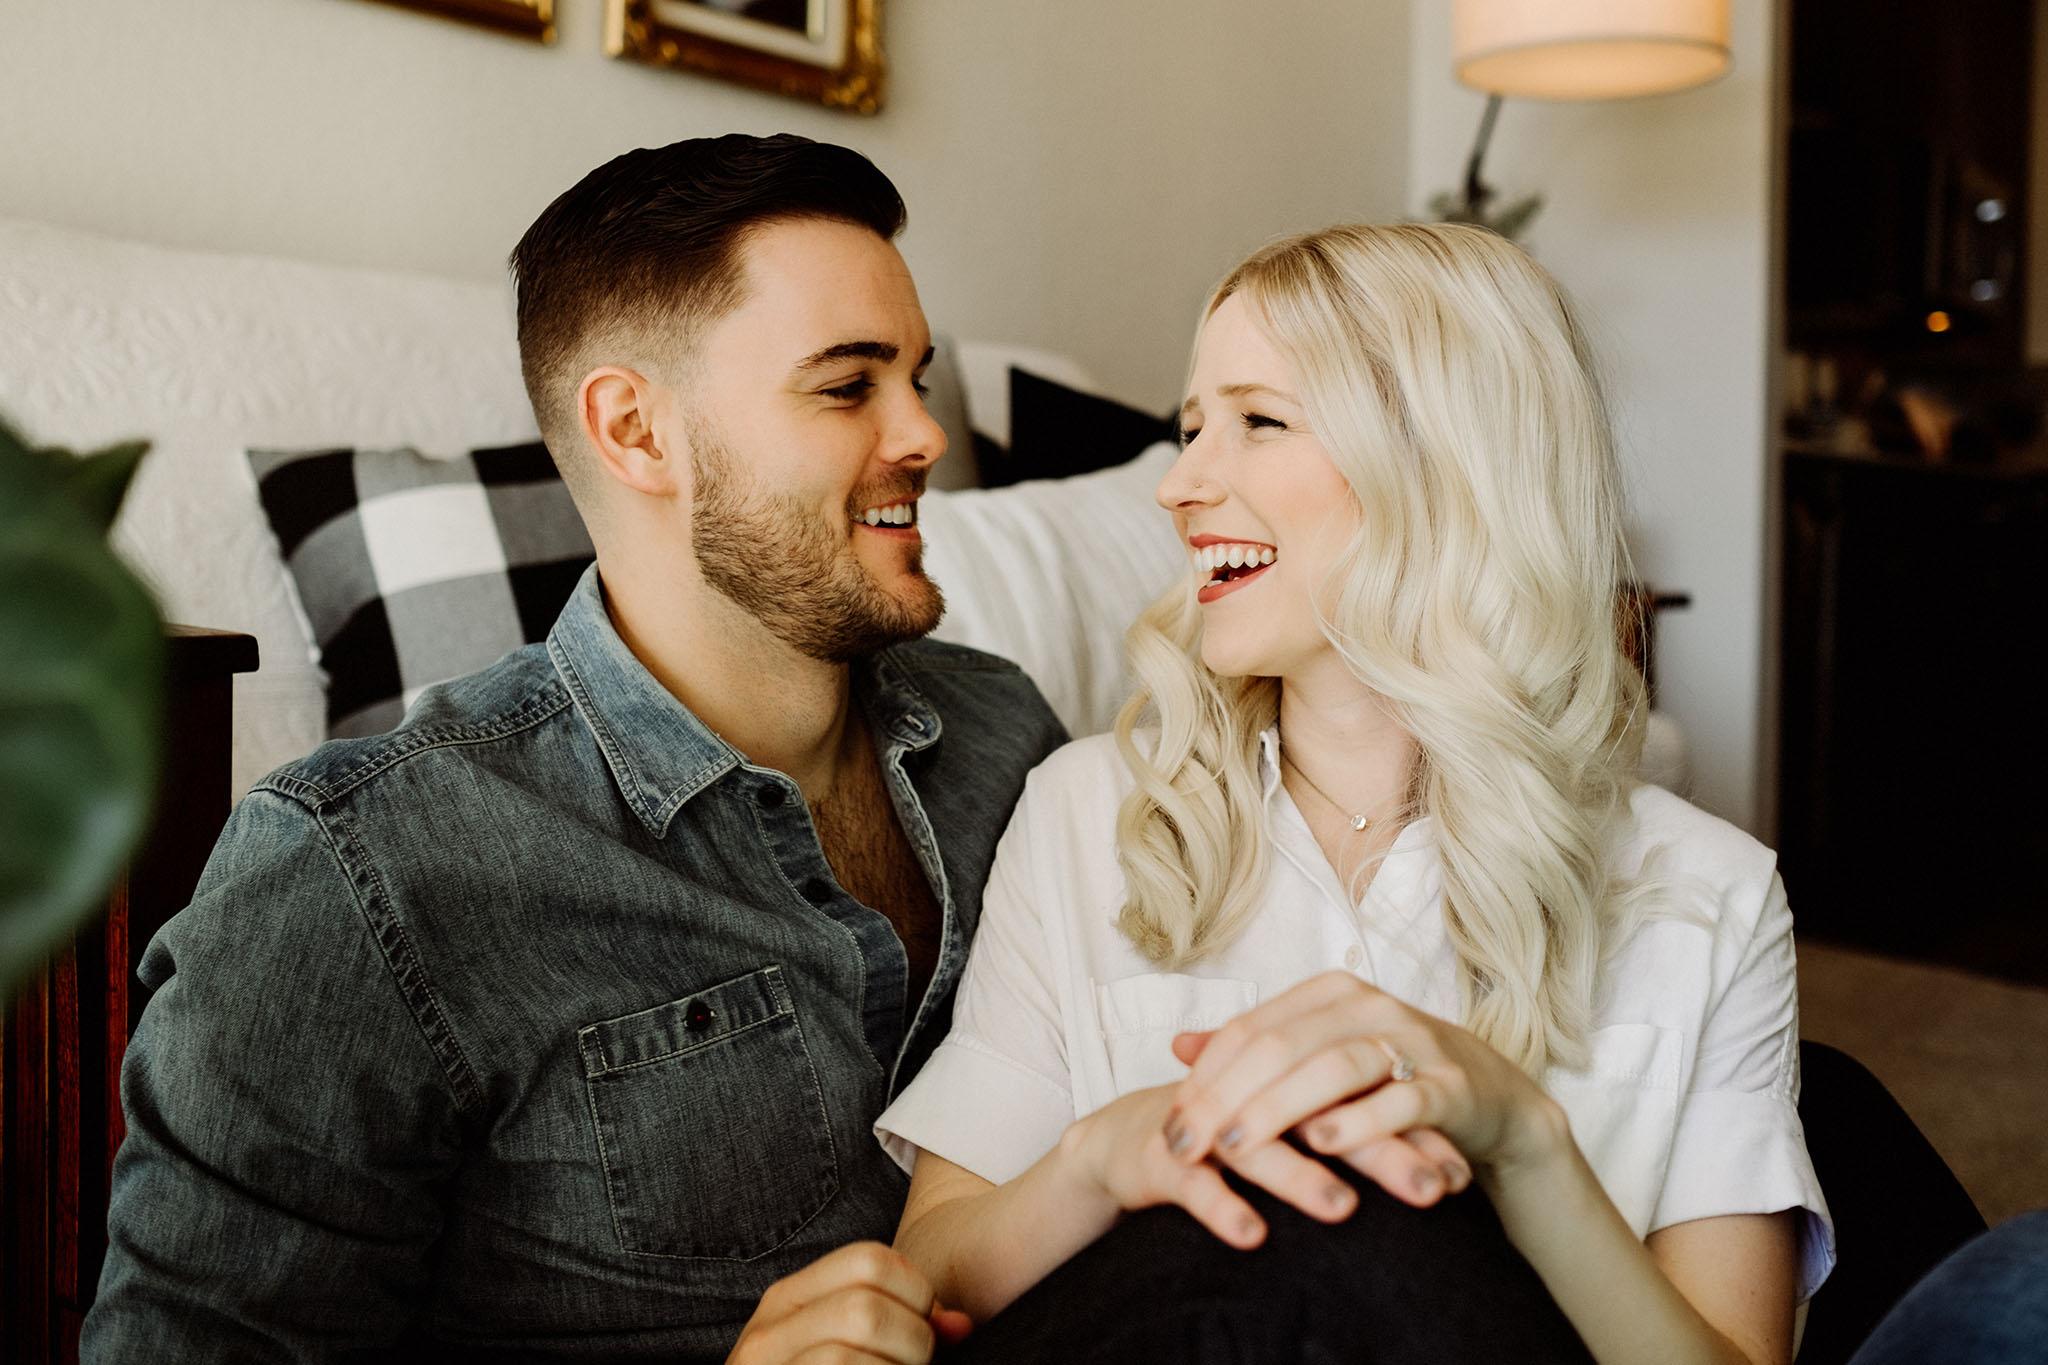 Arizona-in-home-session-wedding-photographer (21).jpg